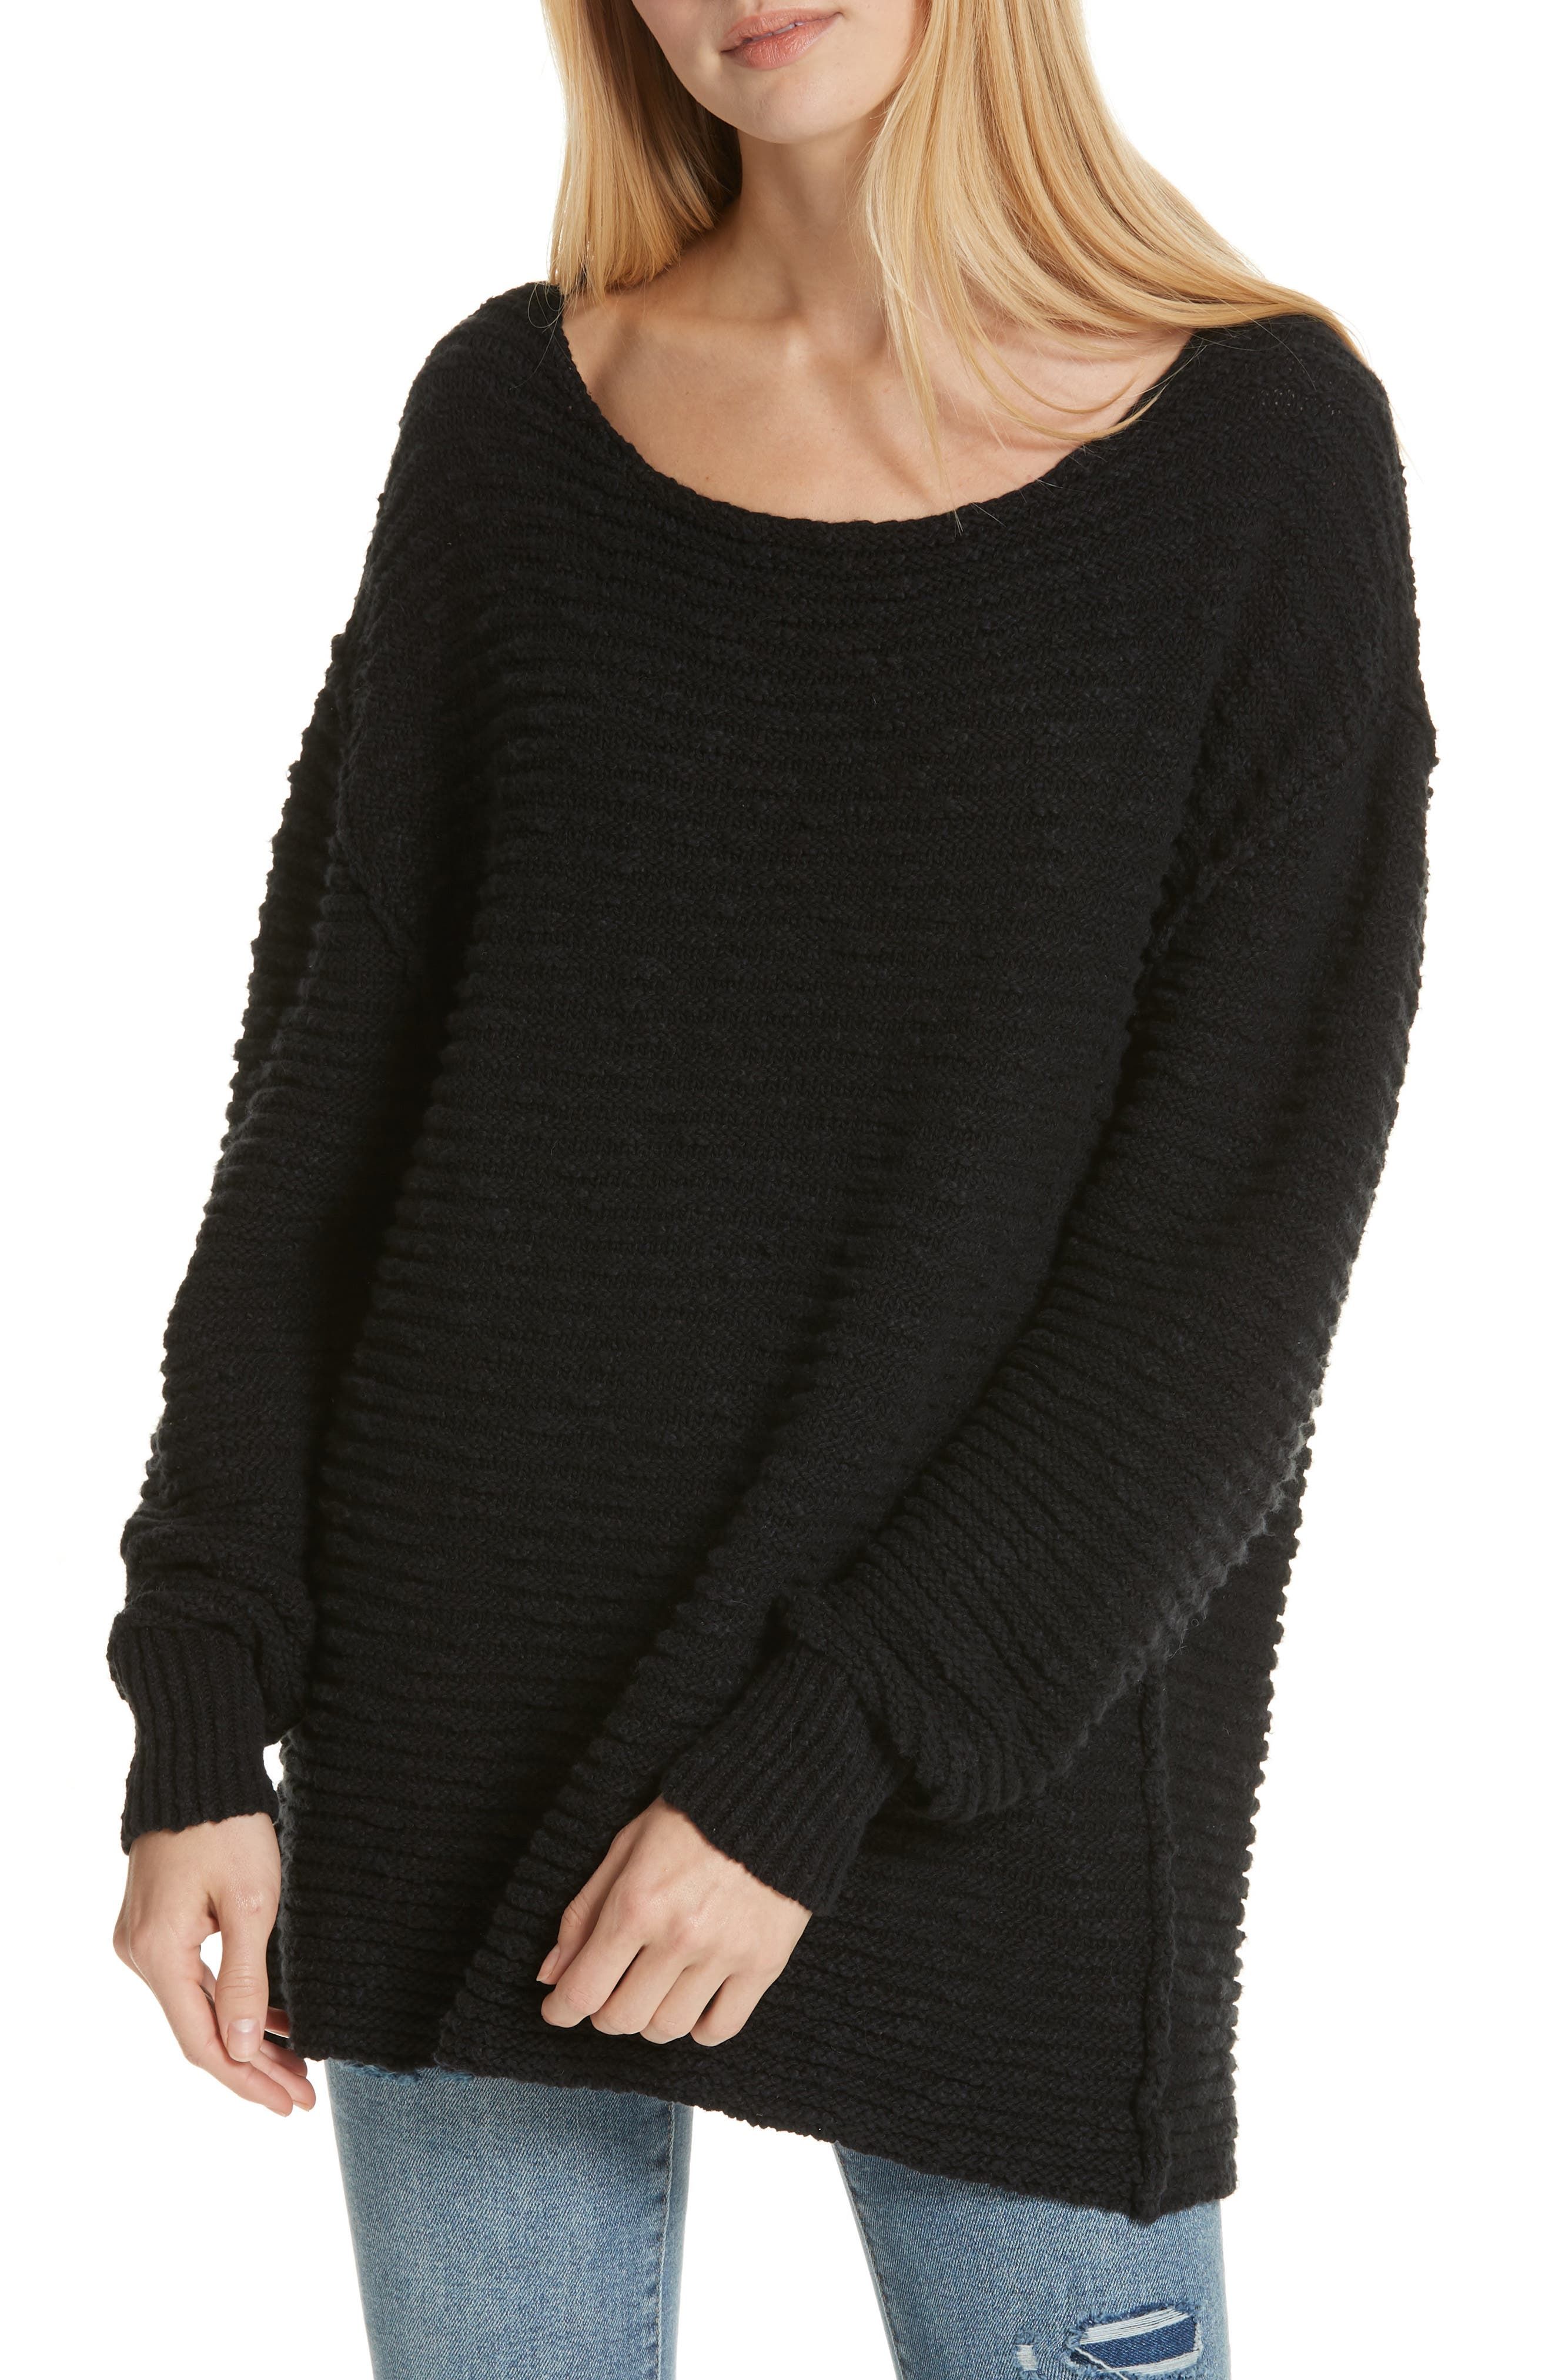 Menace Solid Tunic Sweater,                             Main thumbnail 1, color,                             001